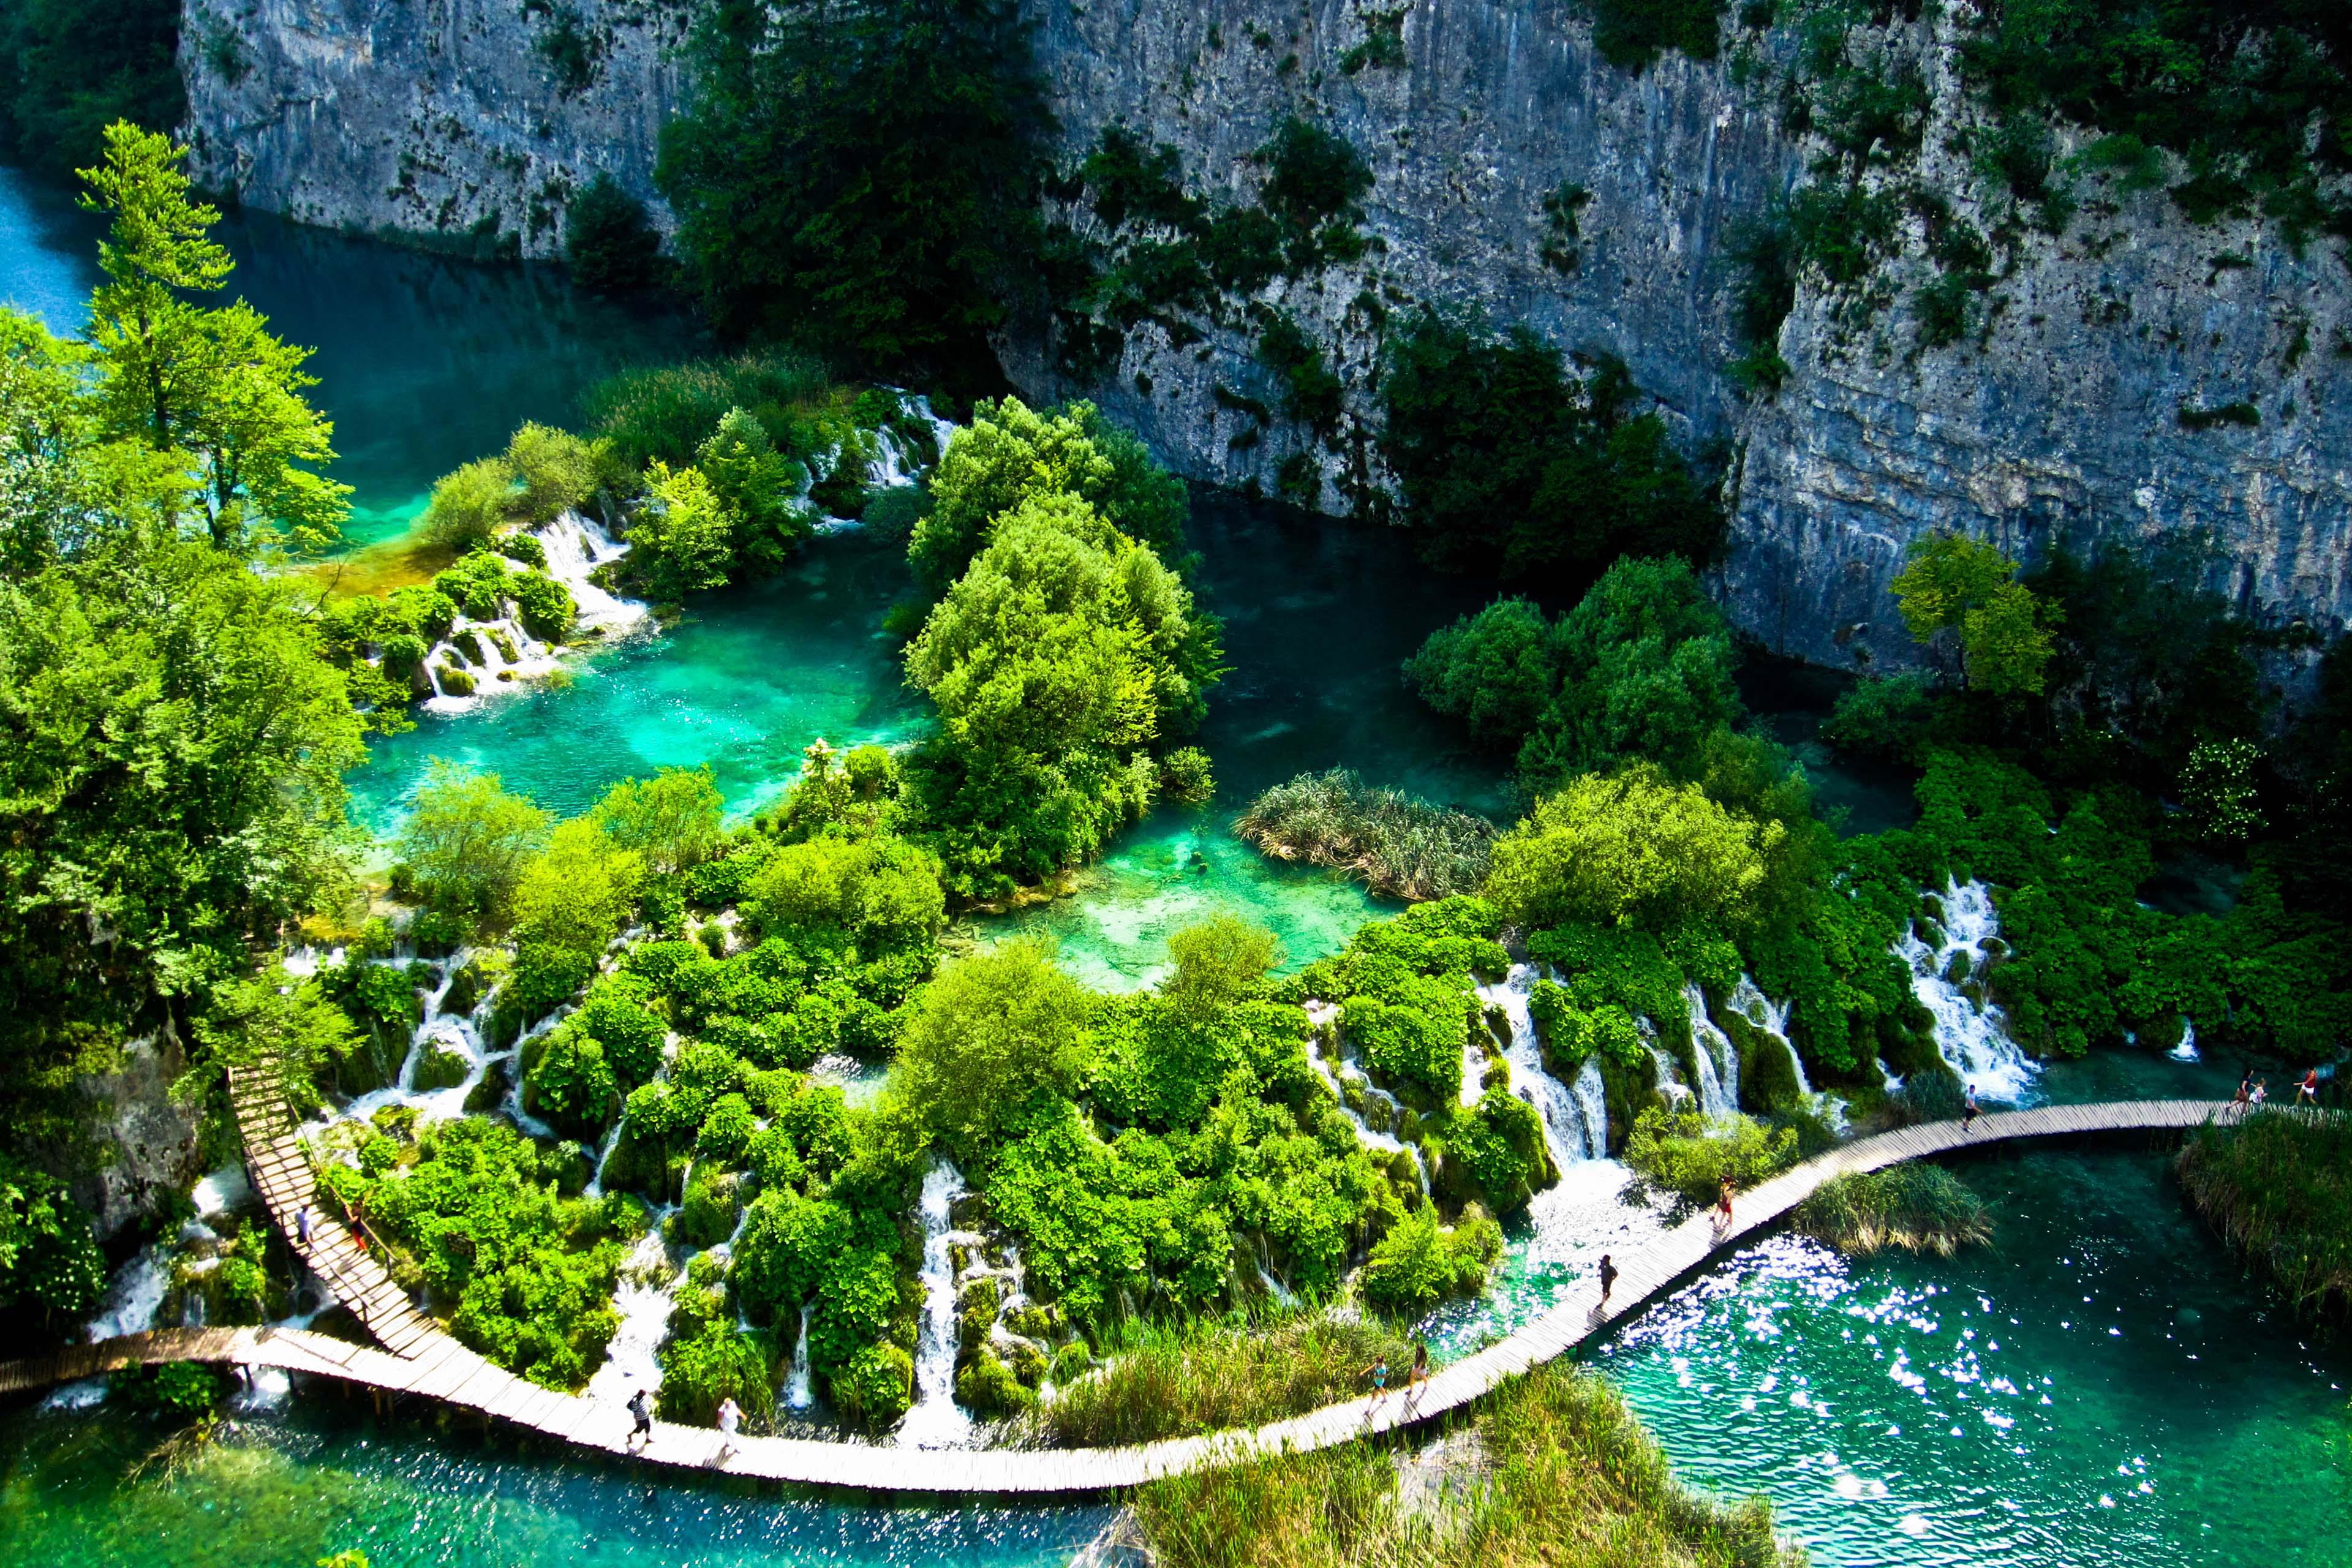 plitvice-lakes-croatia-national-park-wallpaper